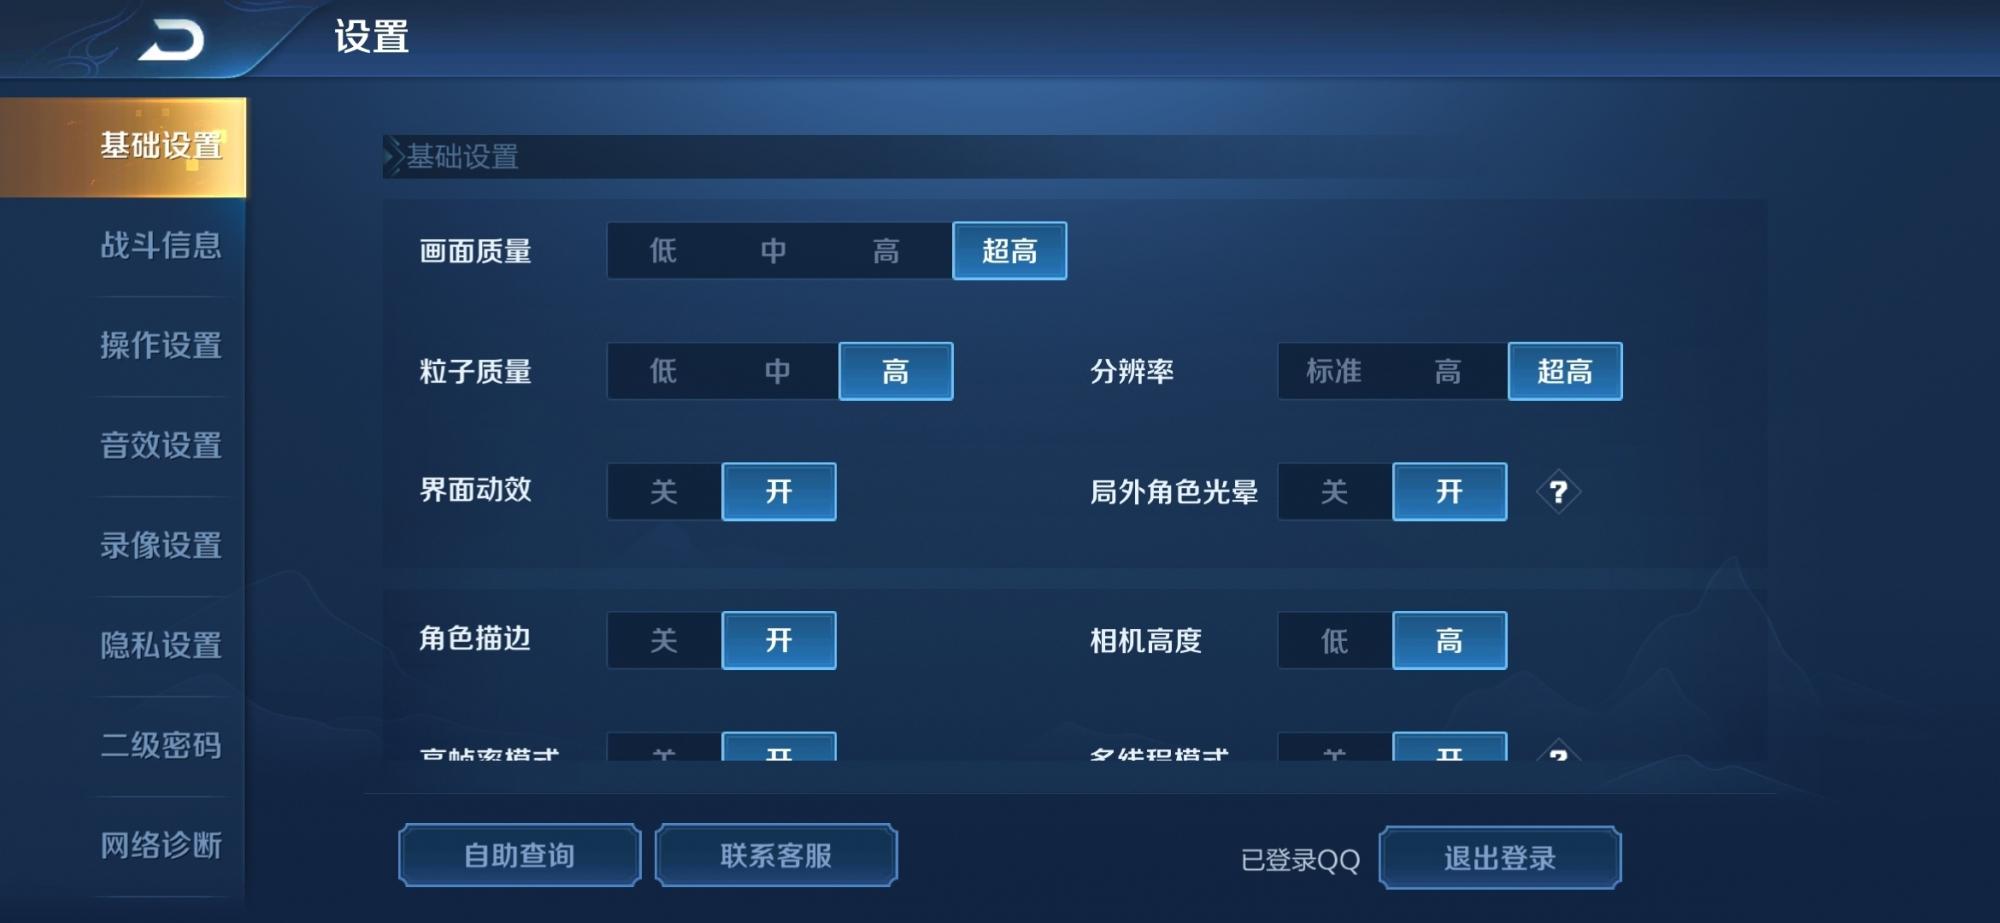 Screenshot_20190912_093628_com.tencent.tmgp.sgame.jpg